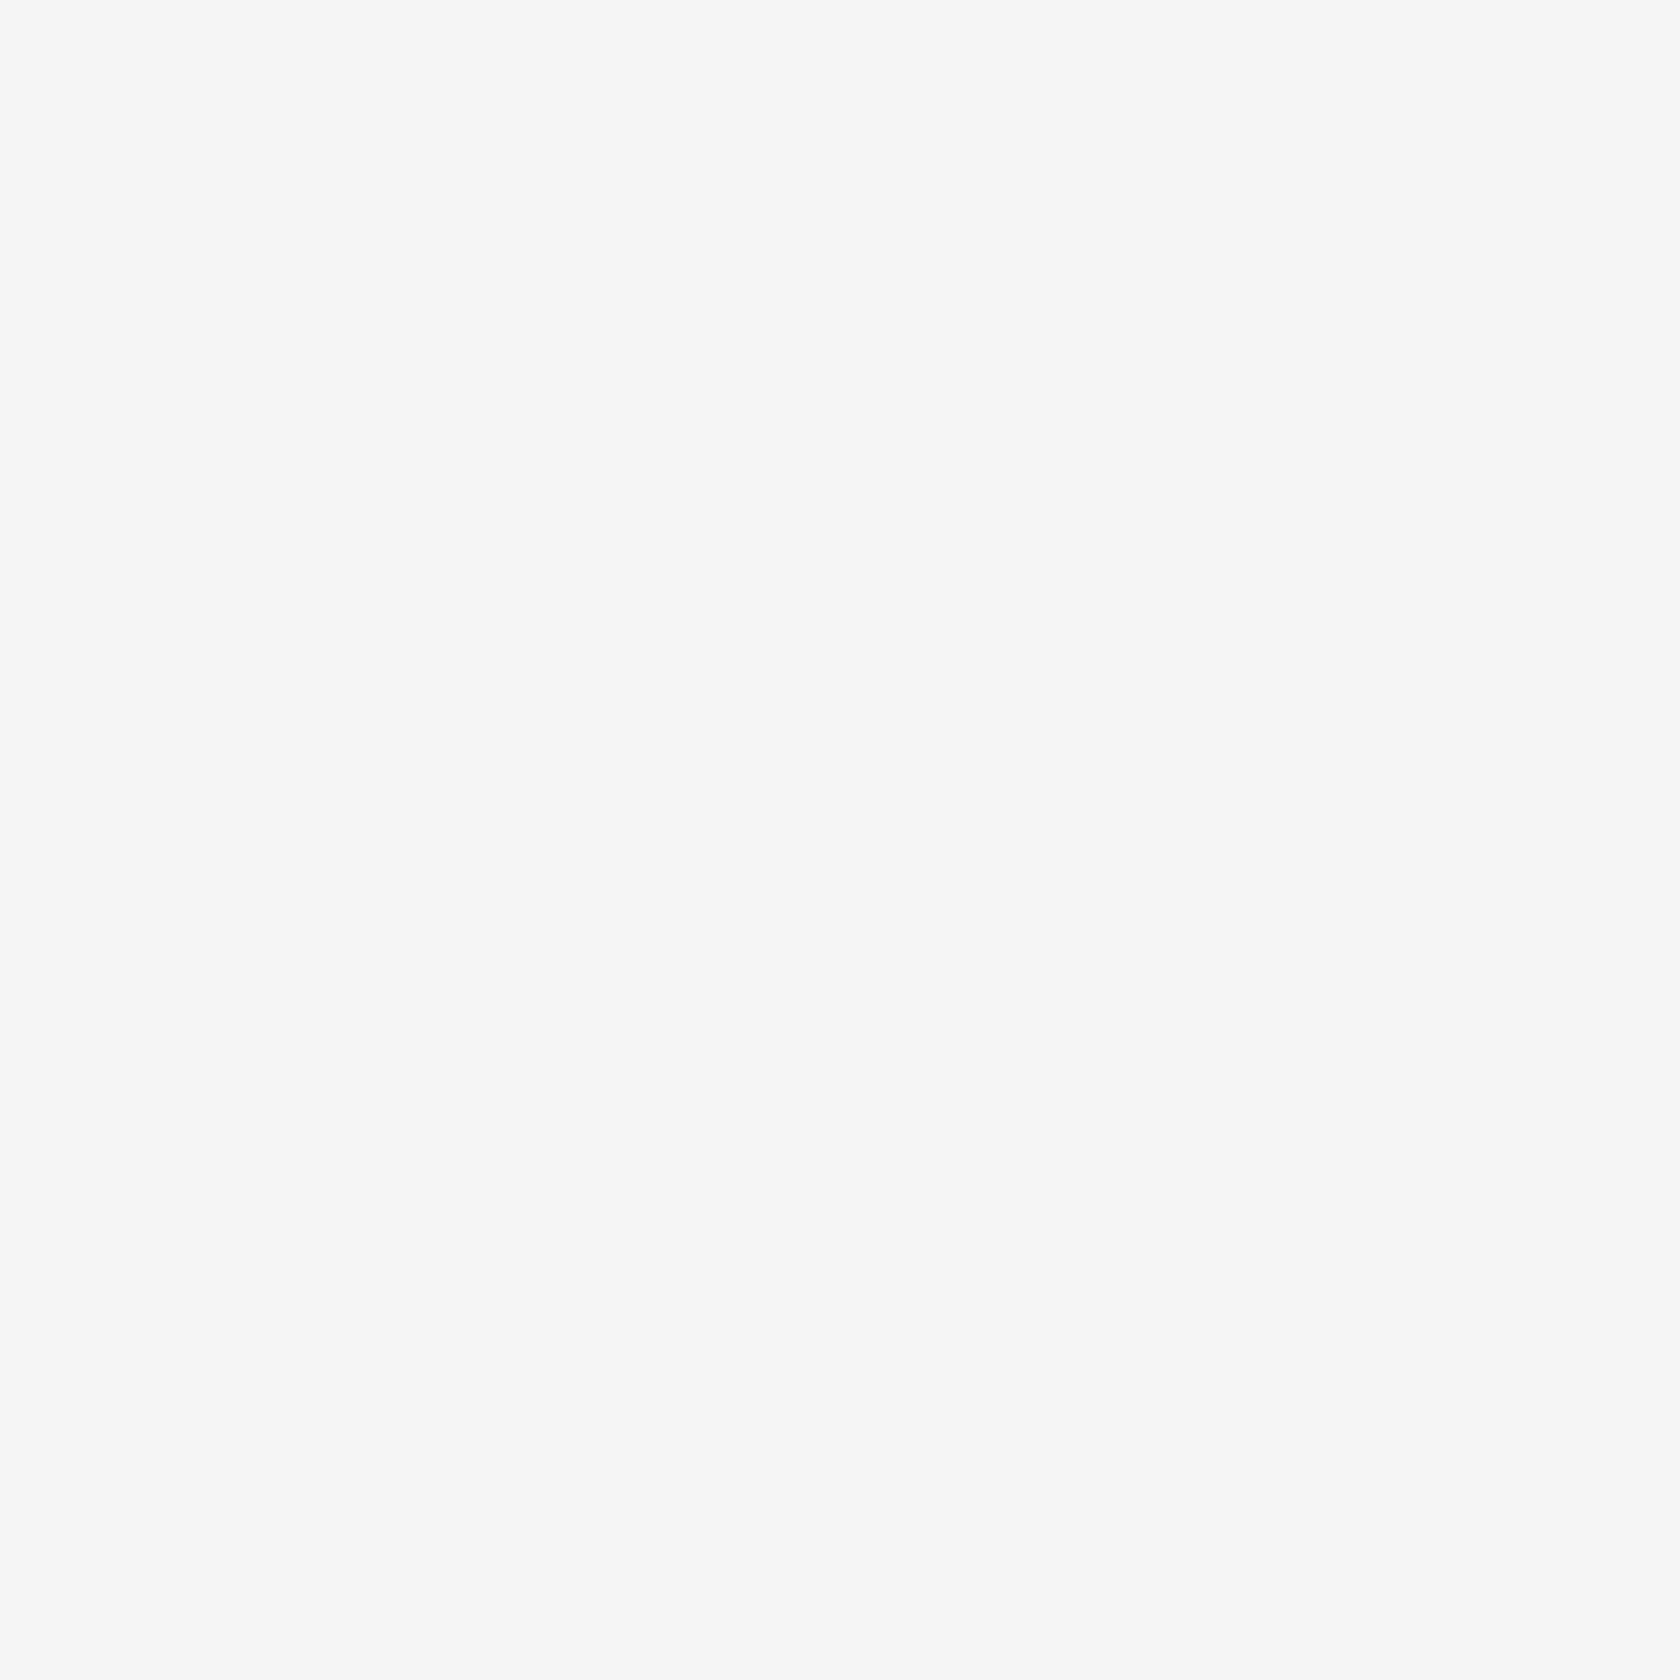 d362c50c065b Kross women training boots   Hermès